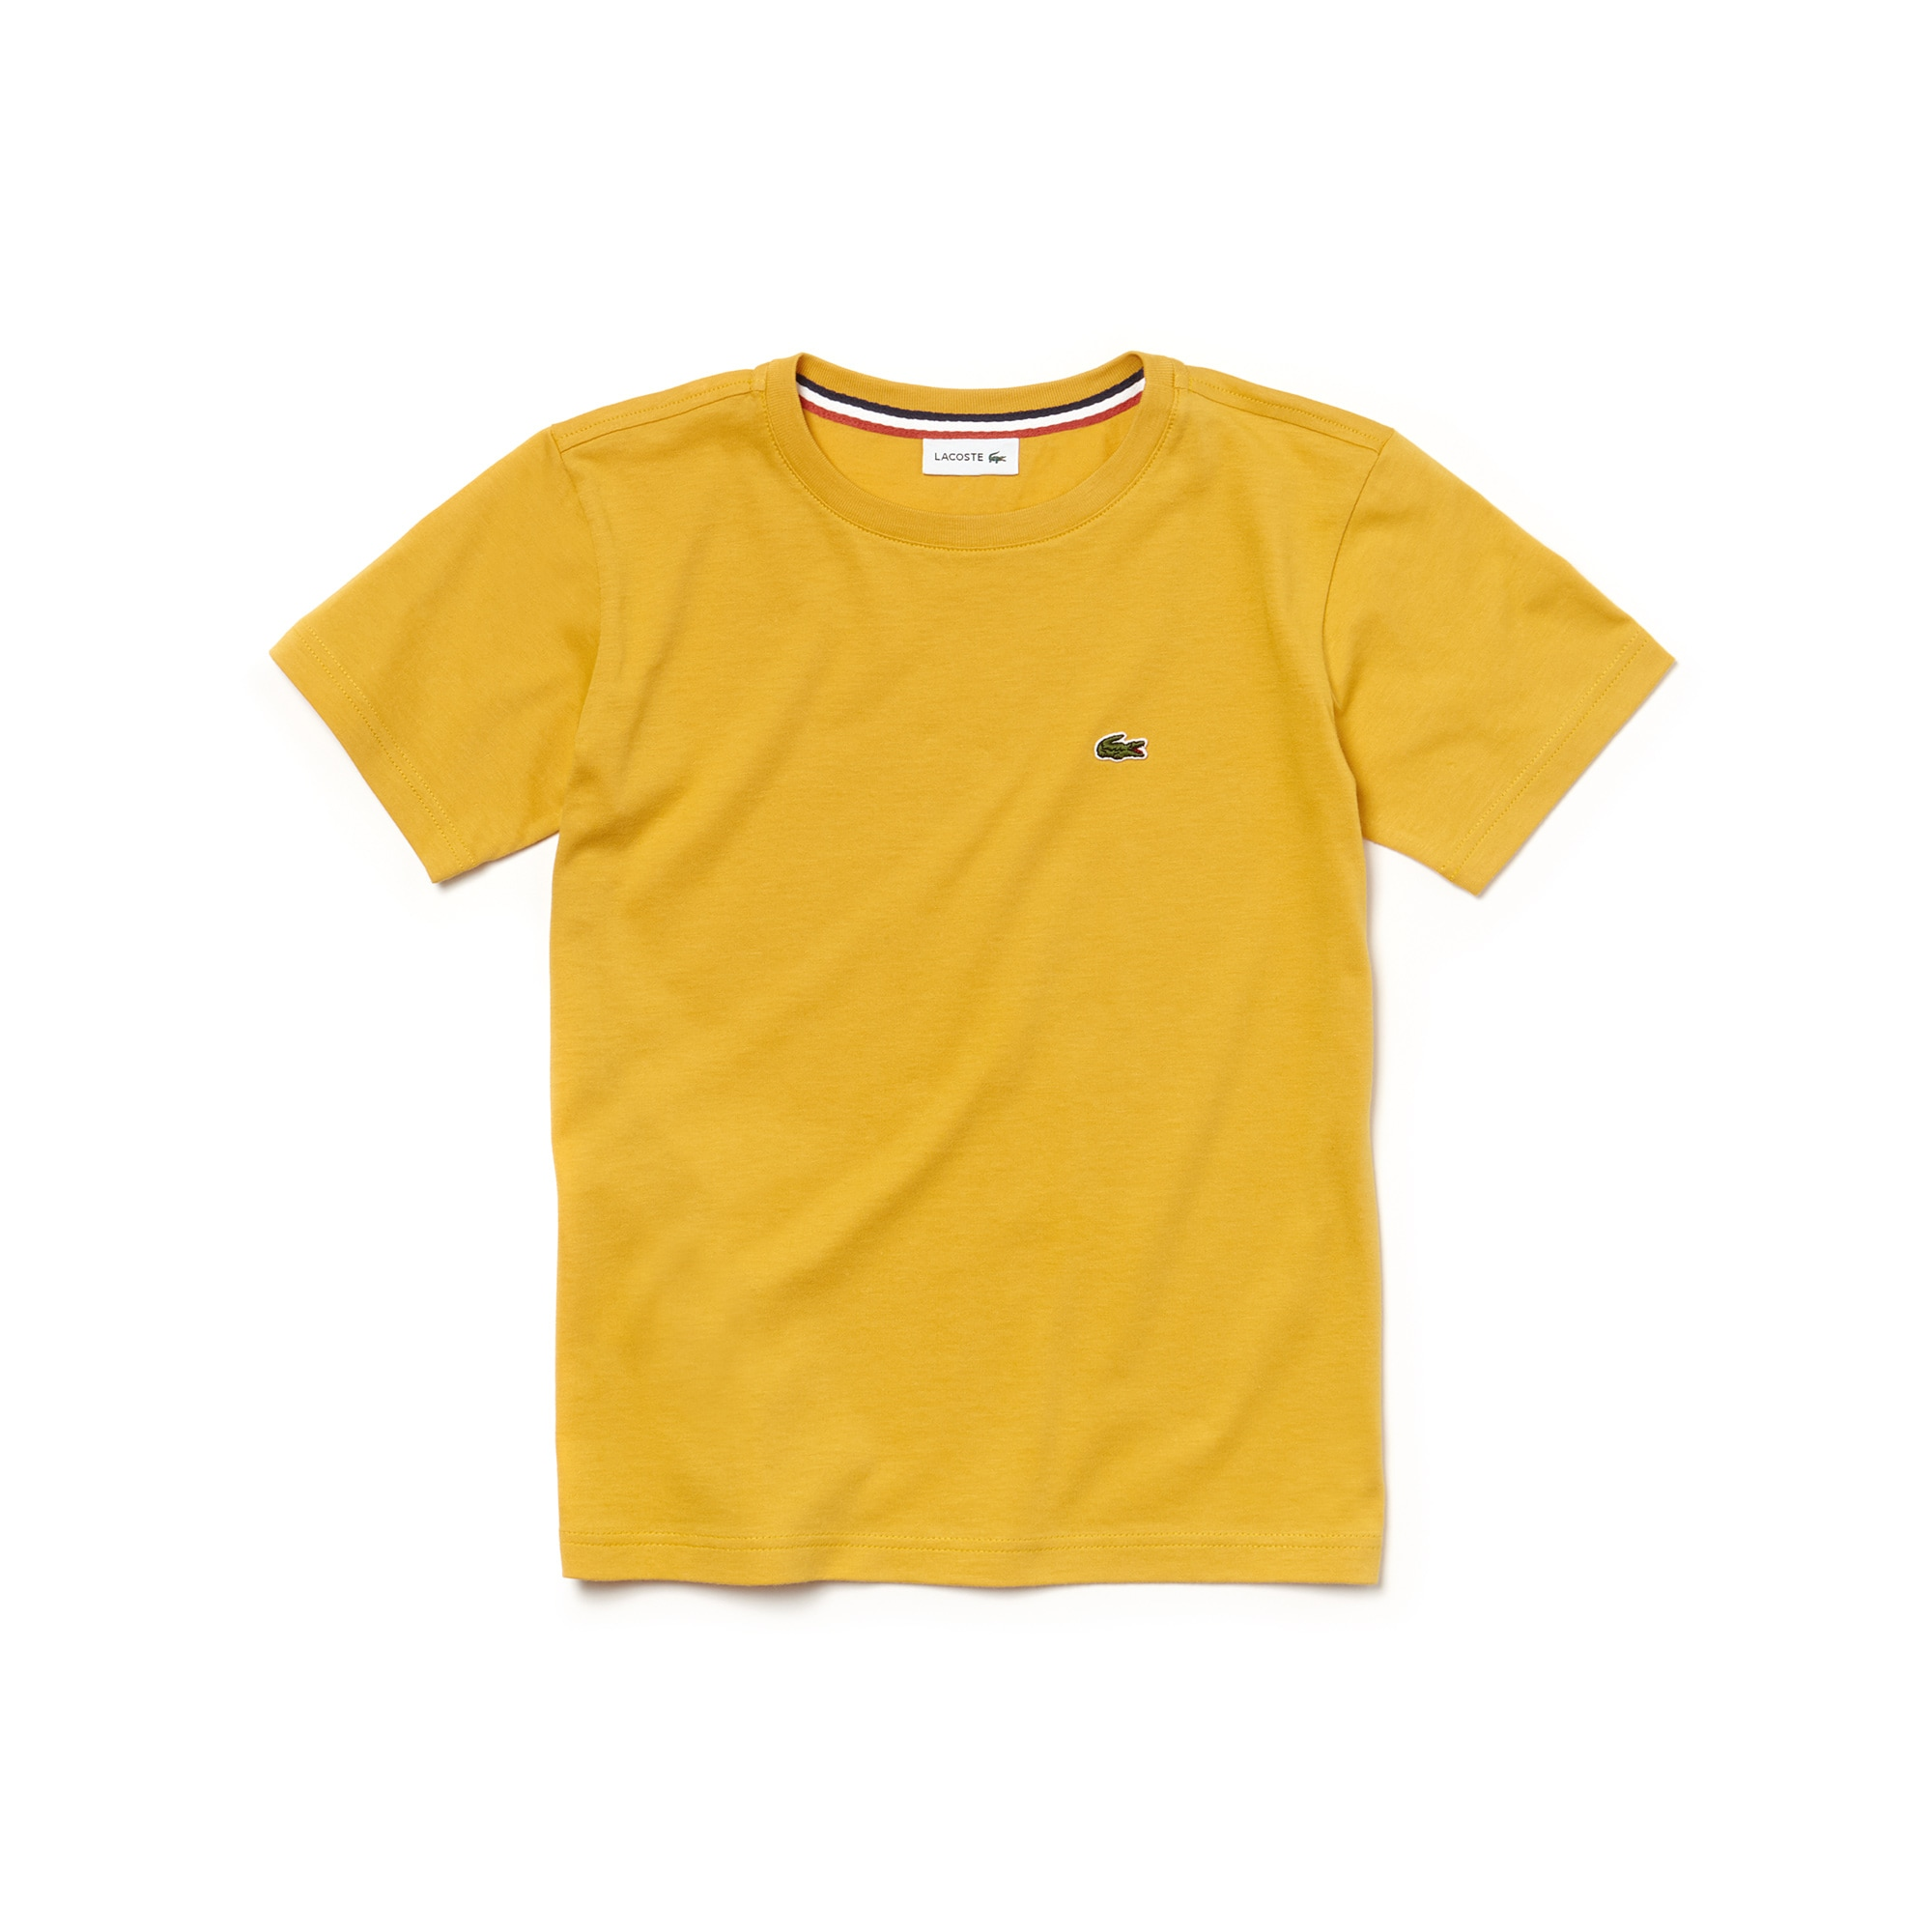 T-shirt a girocollo da bambino in jersey di cotone